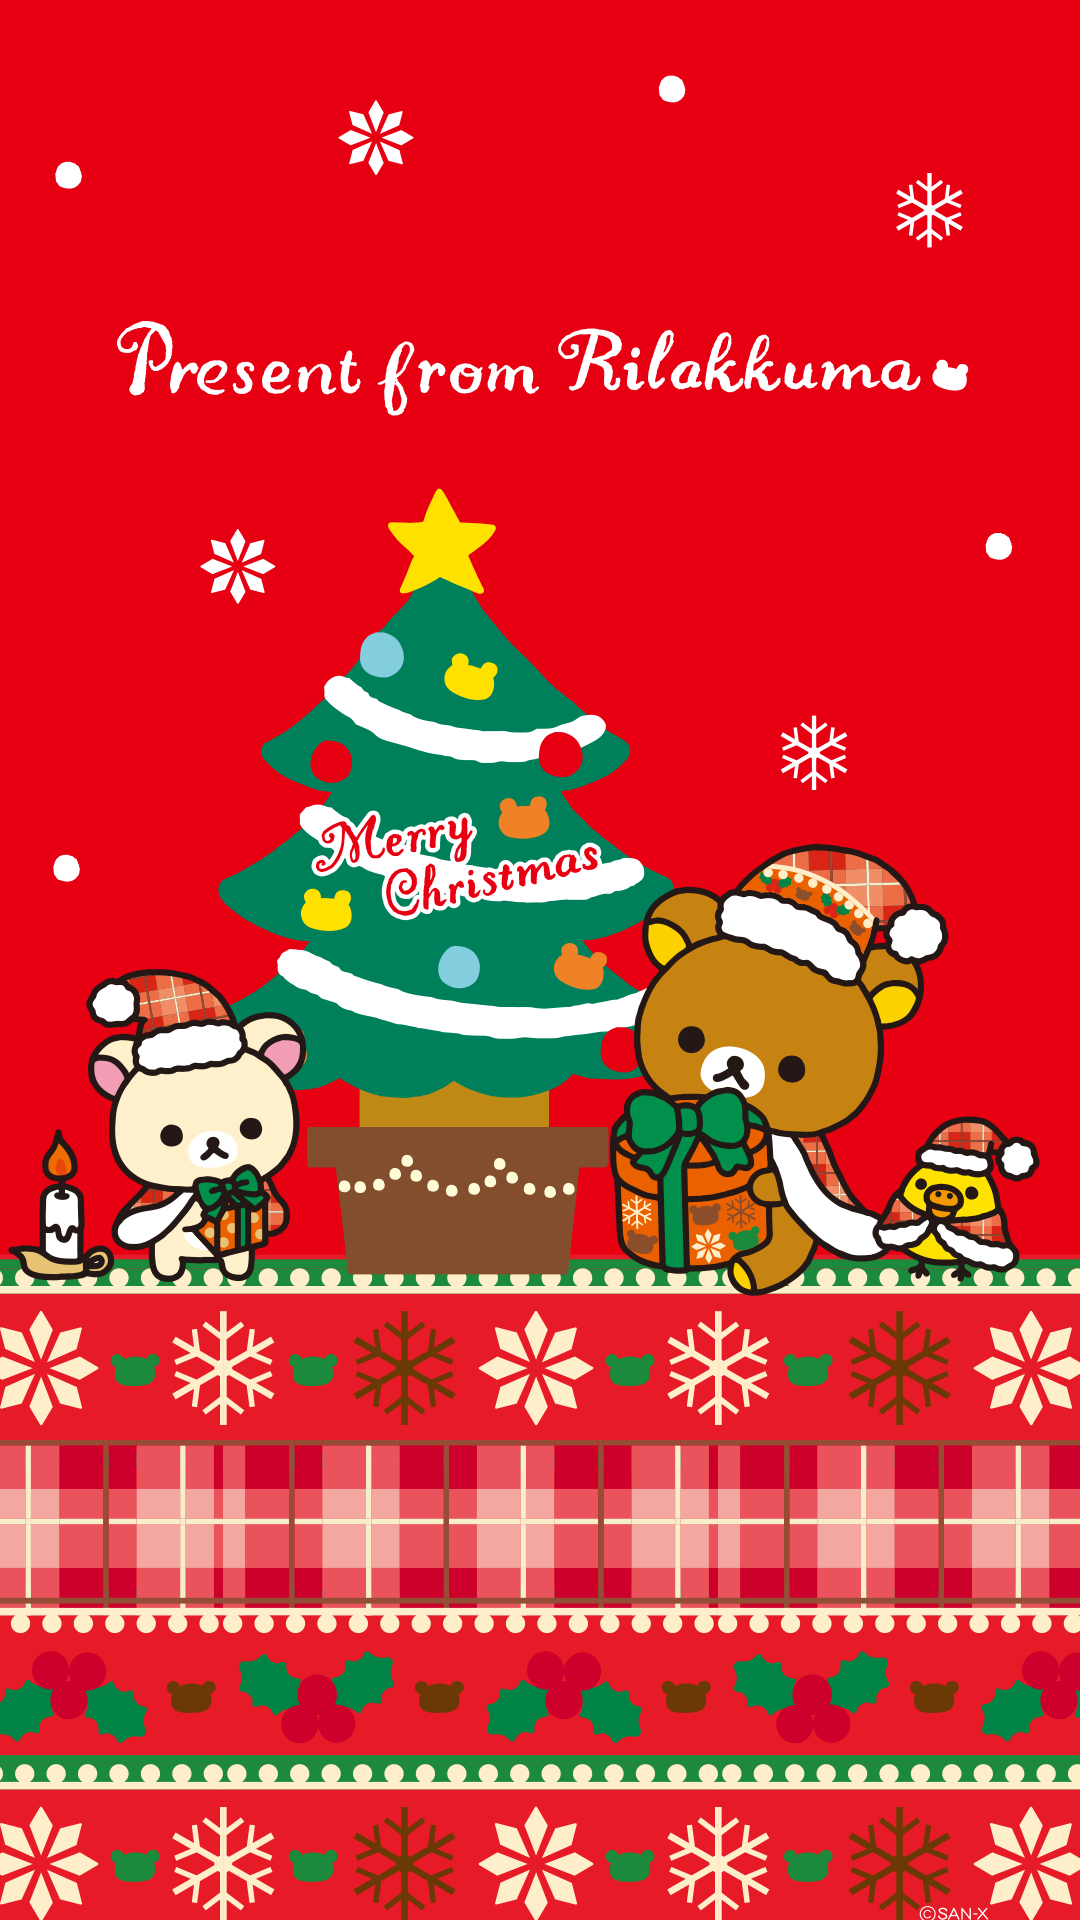 Rilakkuma X Mas Wallpaper For Iphone Android クリスマス壁紙 壁紙 かわいい リラックマ イラスト